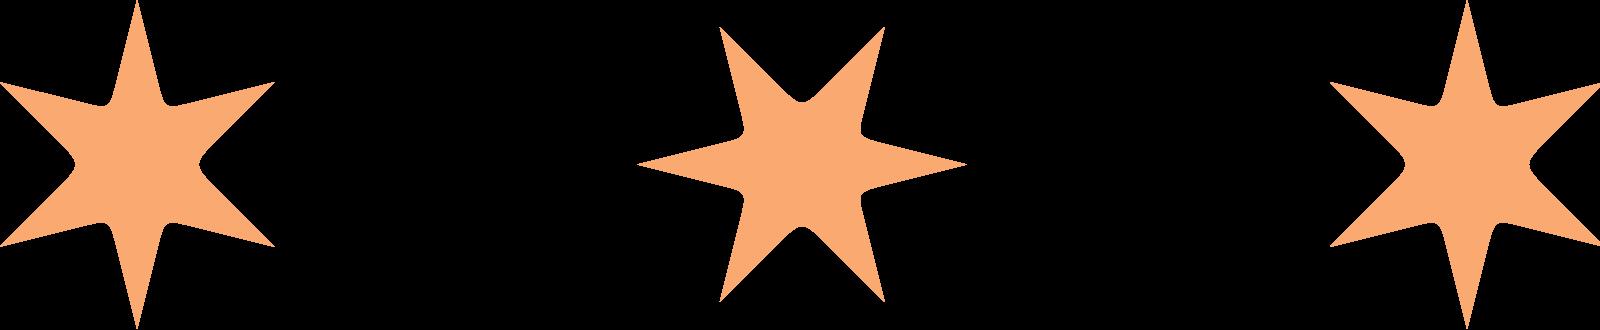 cherry_bomb_logo_3_stars.png